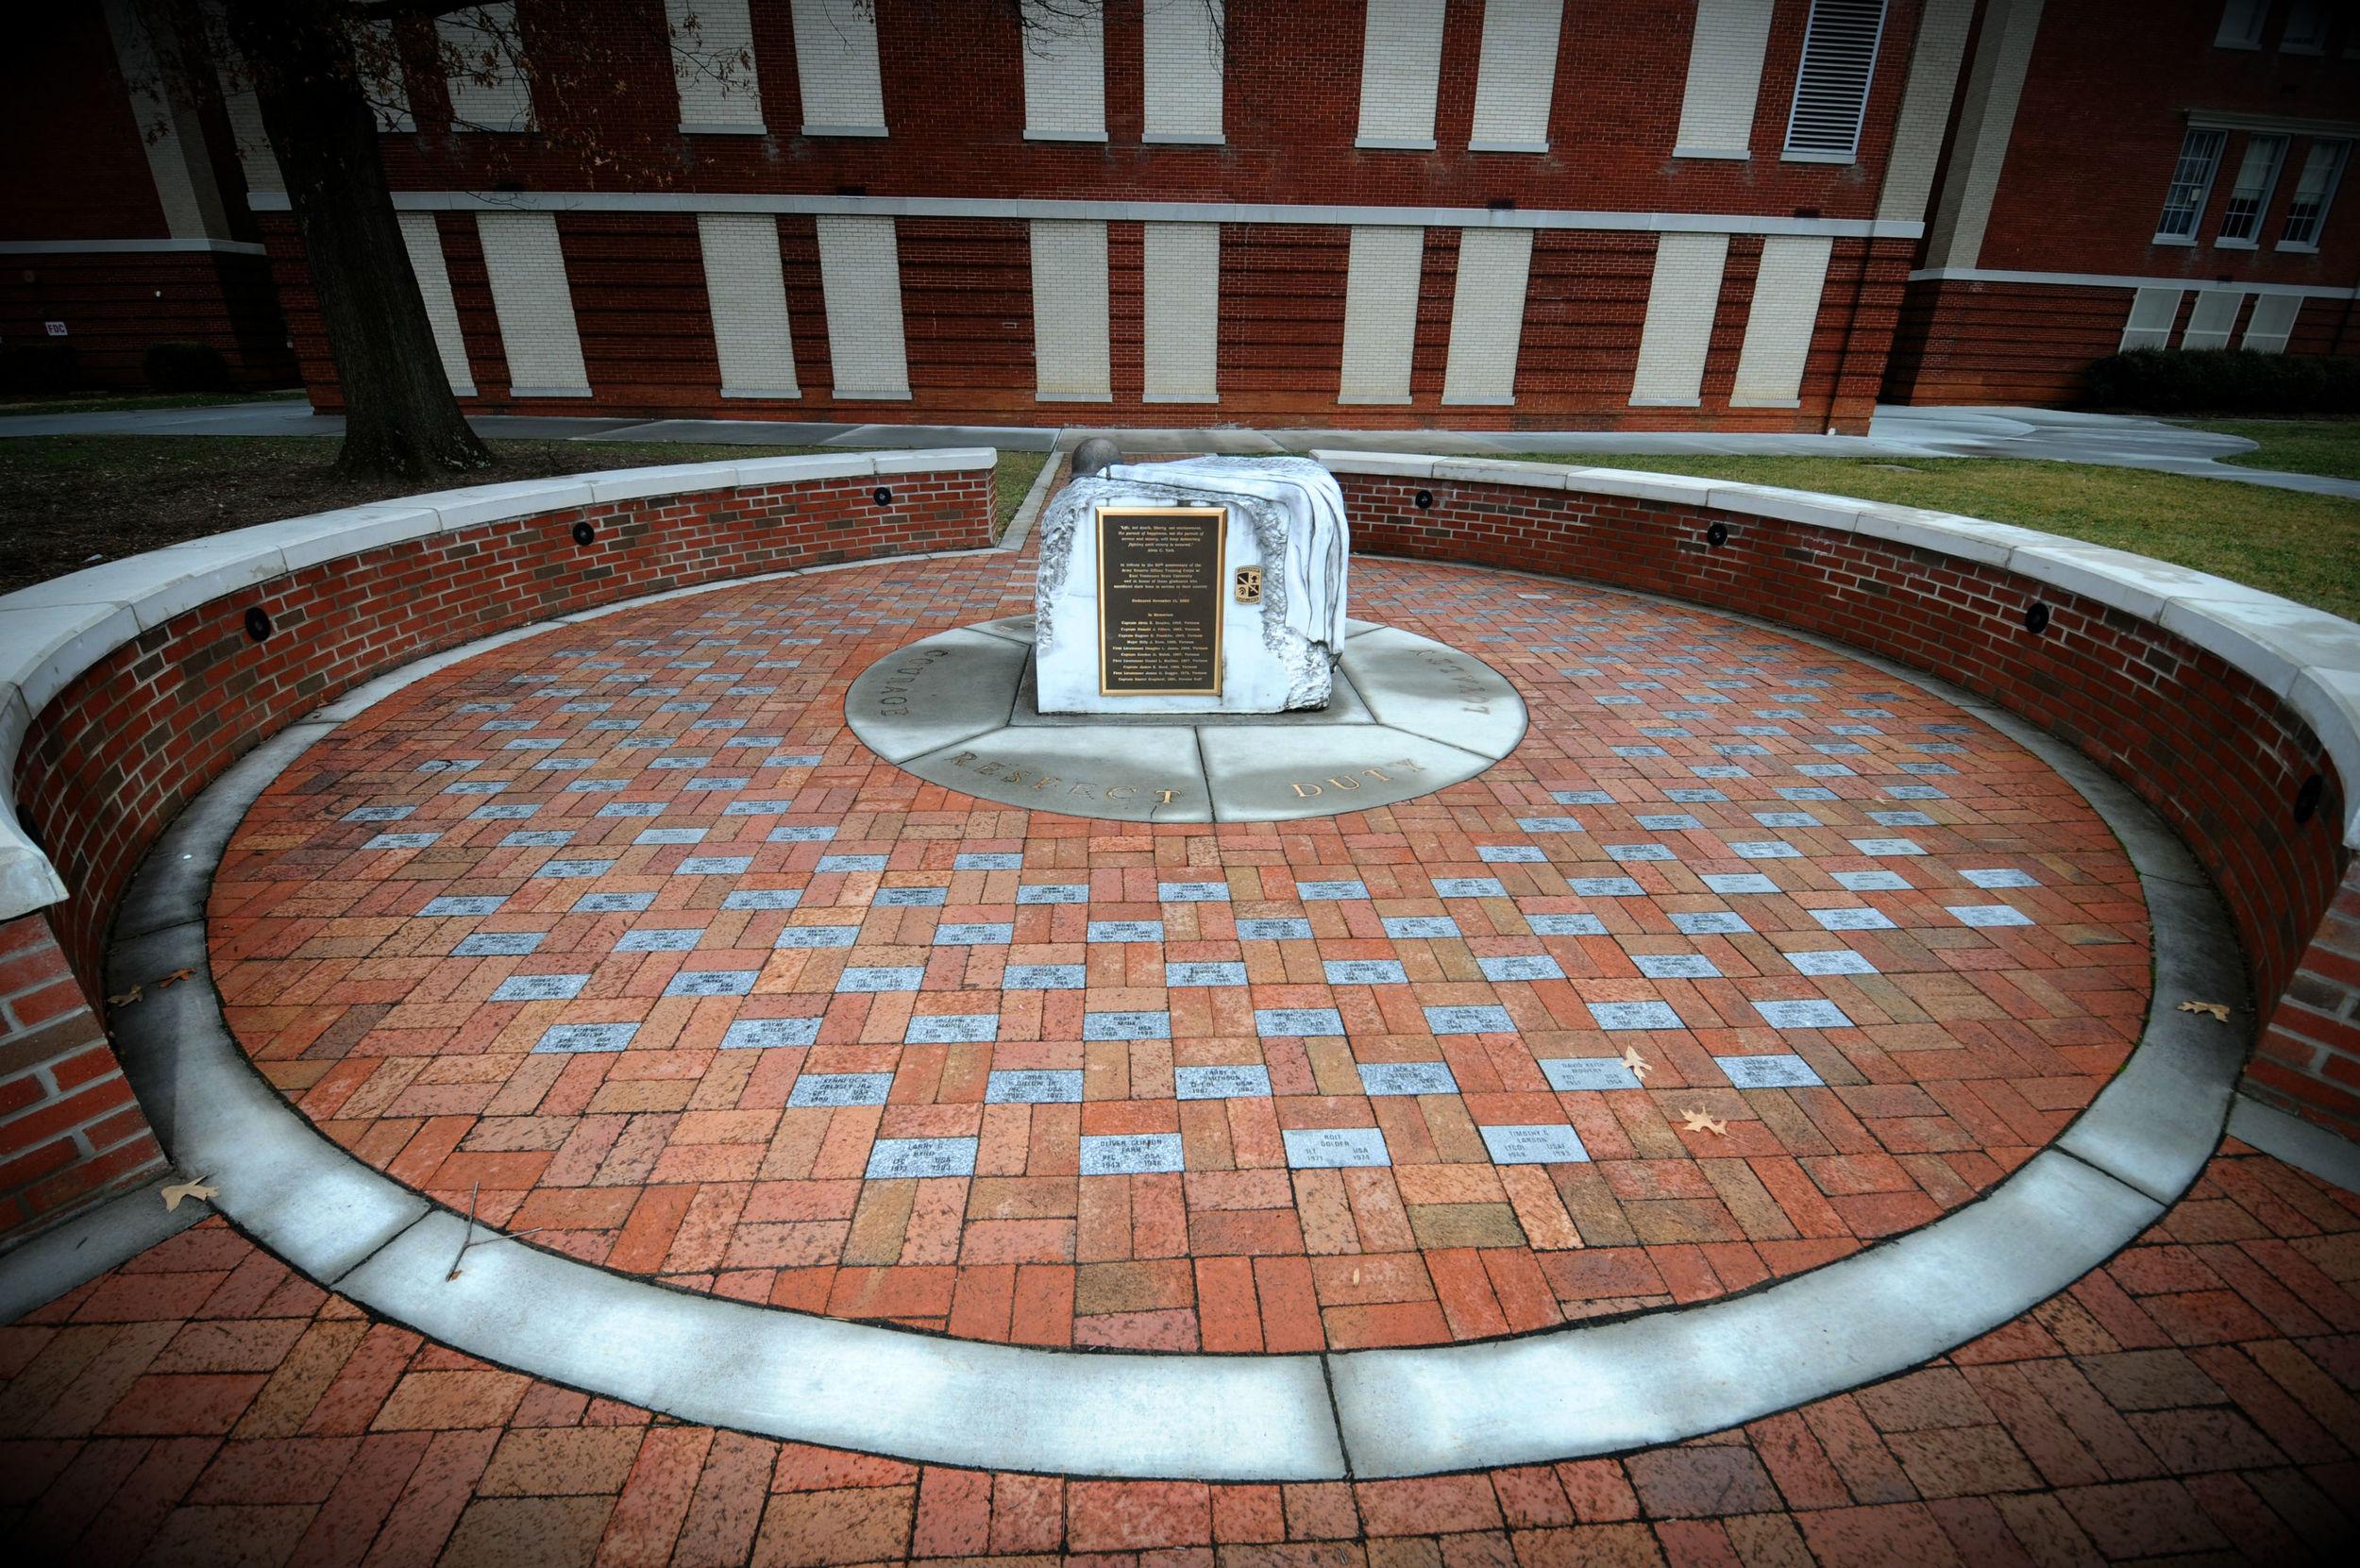 ETSU Veterans Memorial